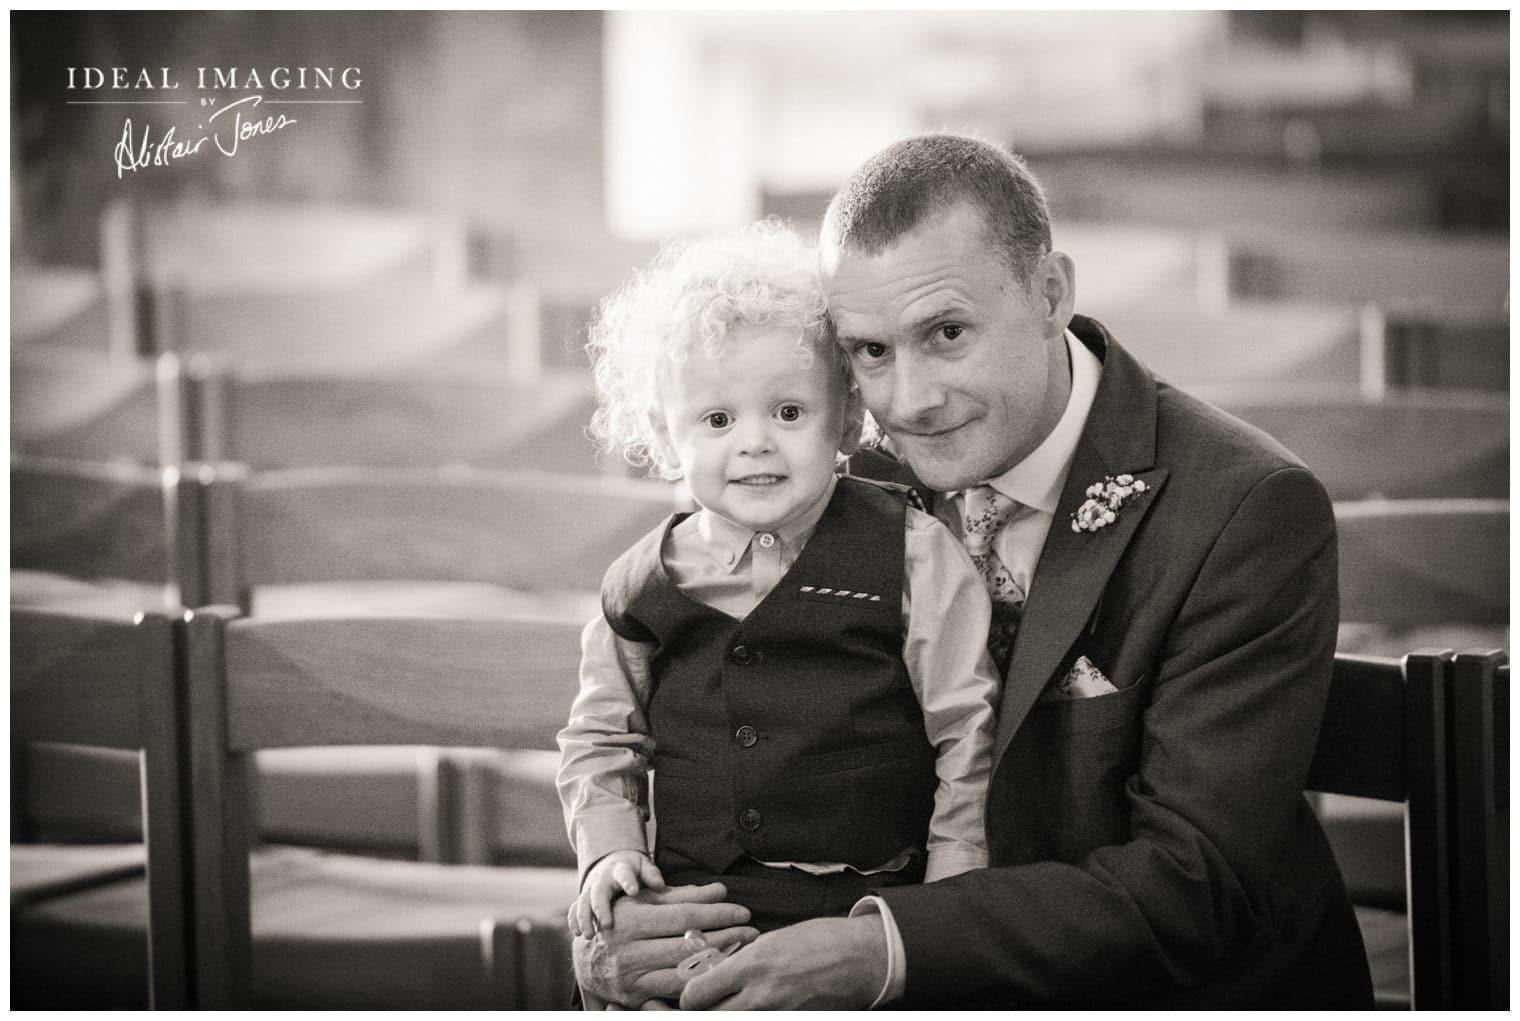 canterbury_cathedral_wedding-076